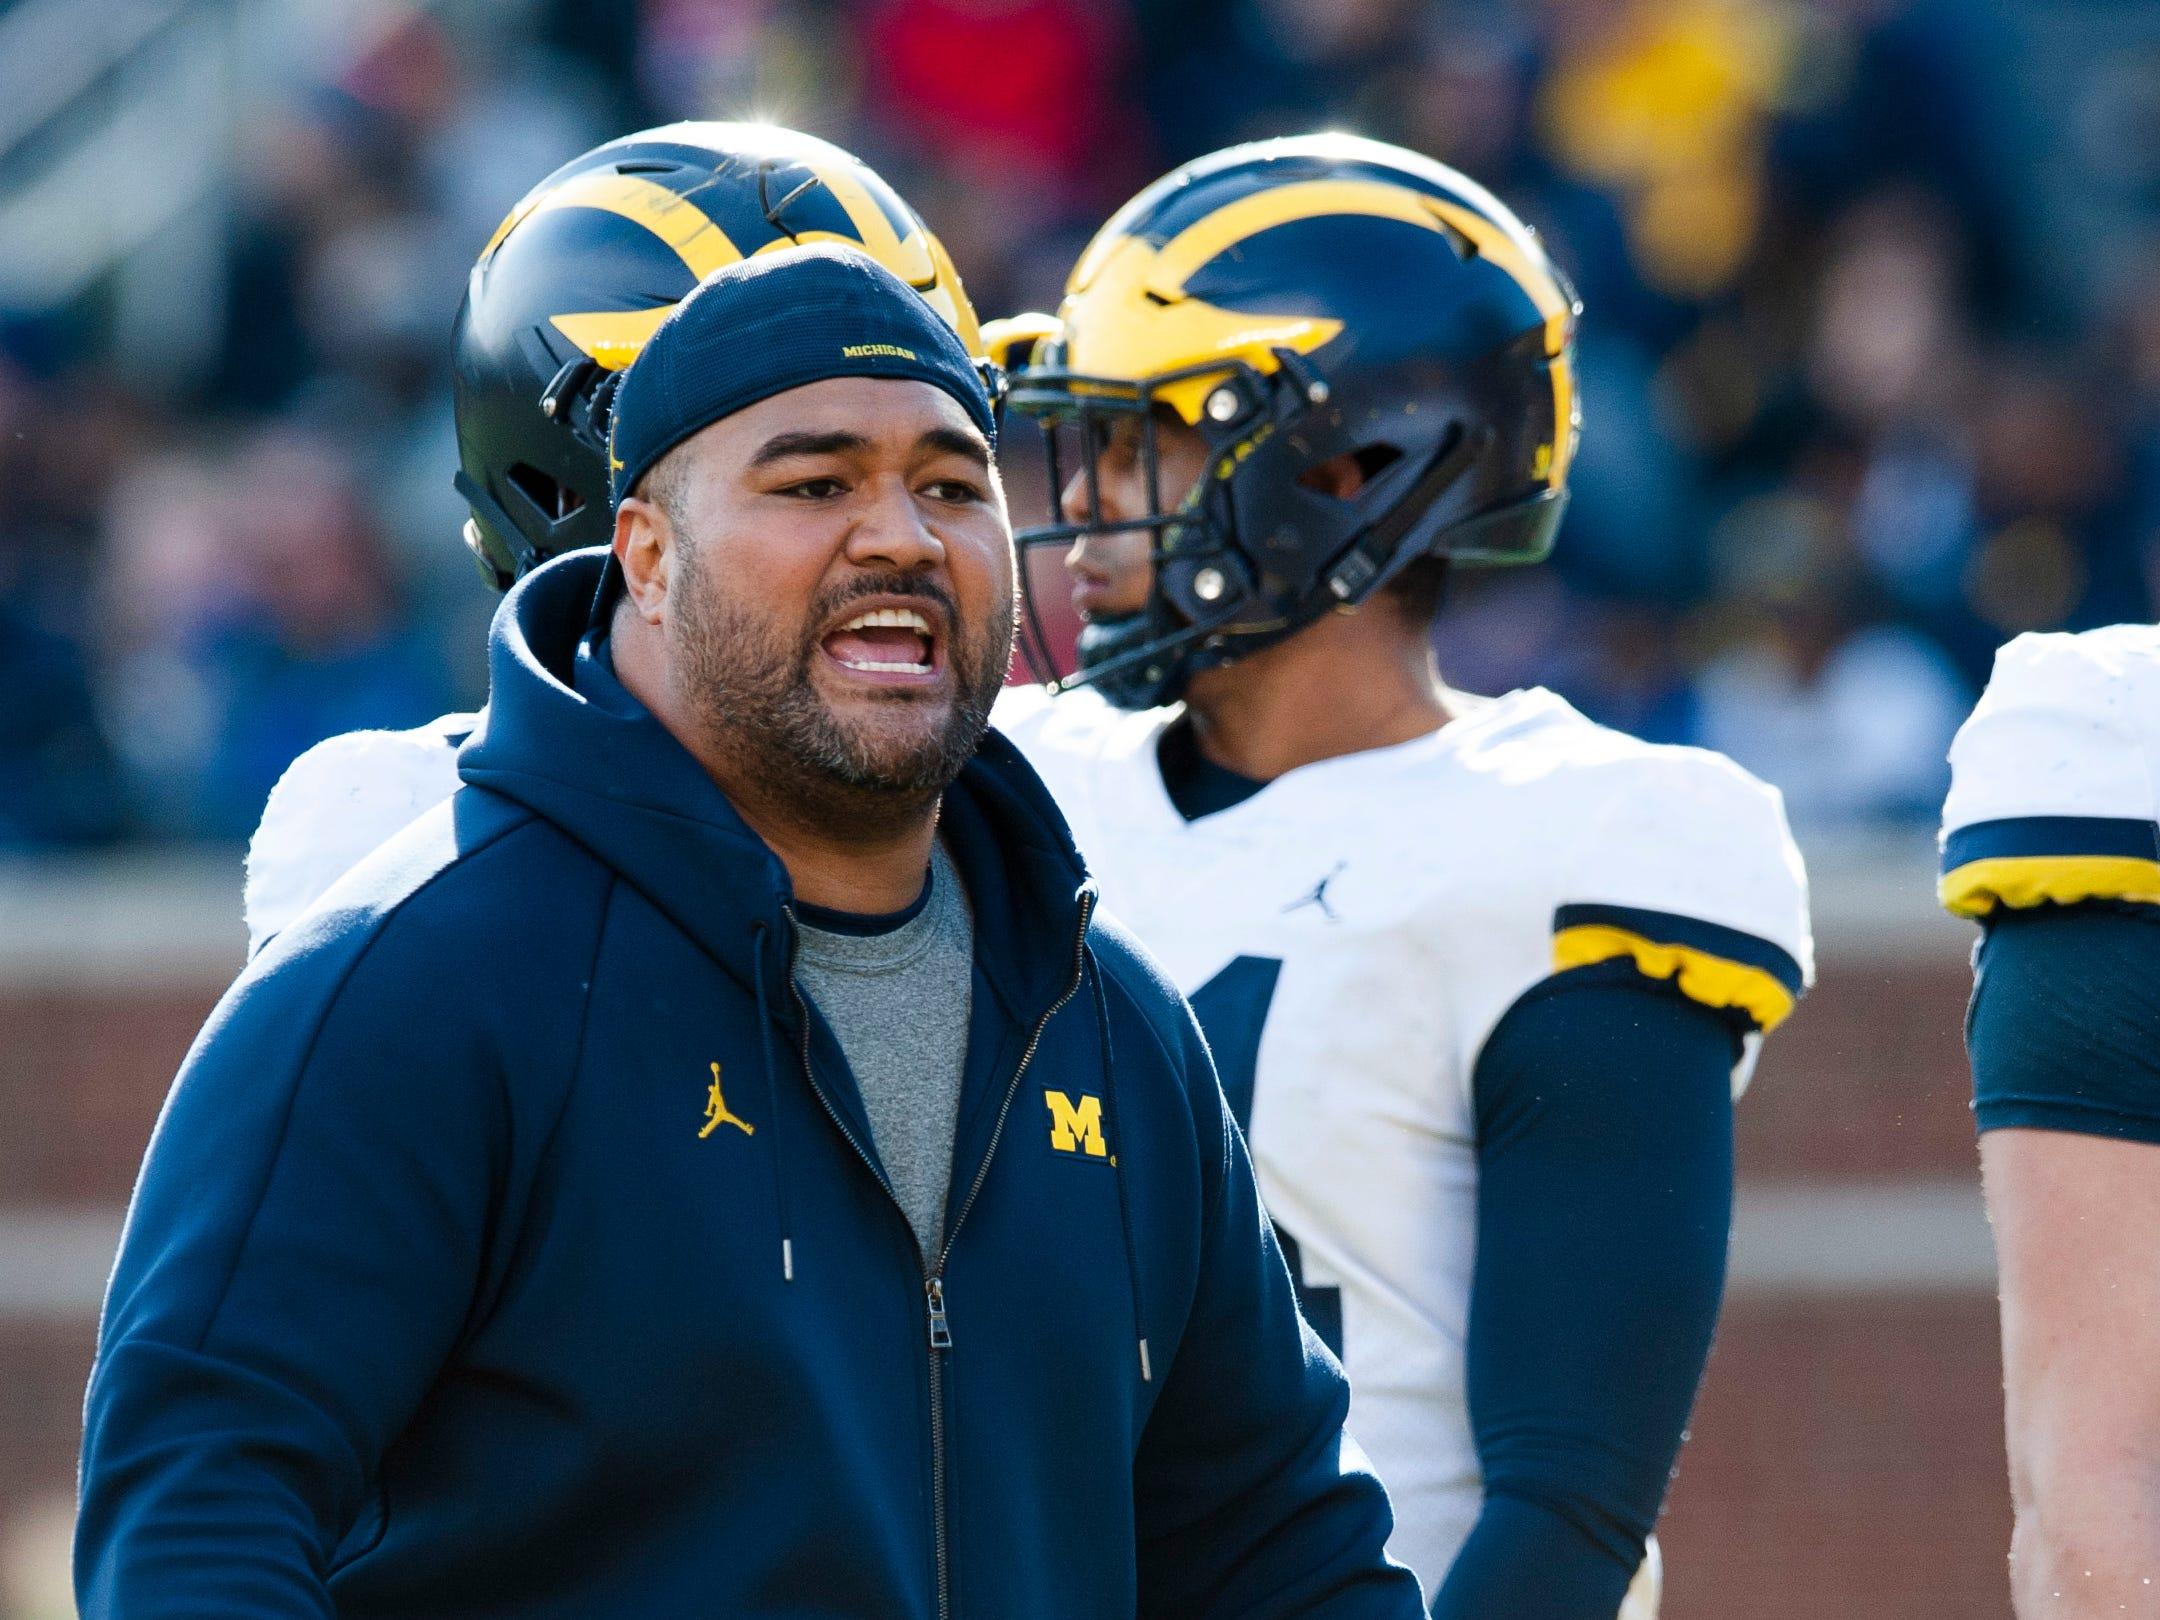 New Michigan defensive line coach Shaun Nua yells at the players.